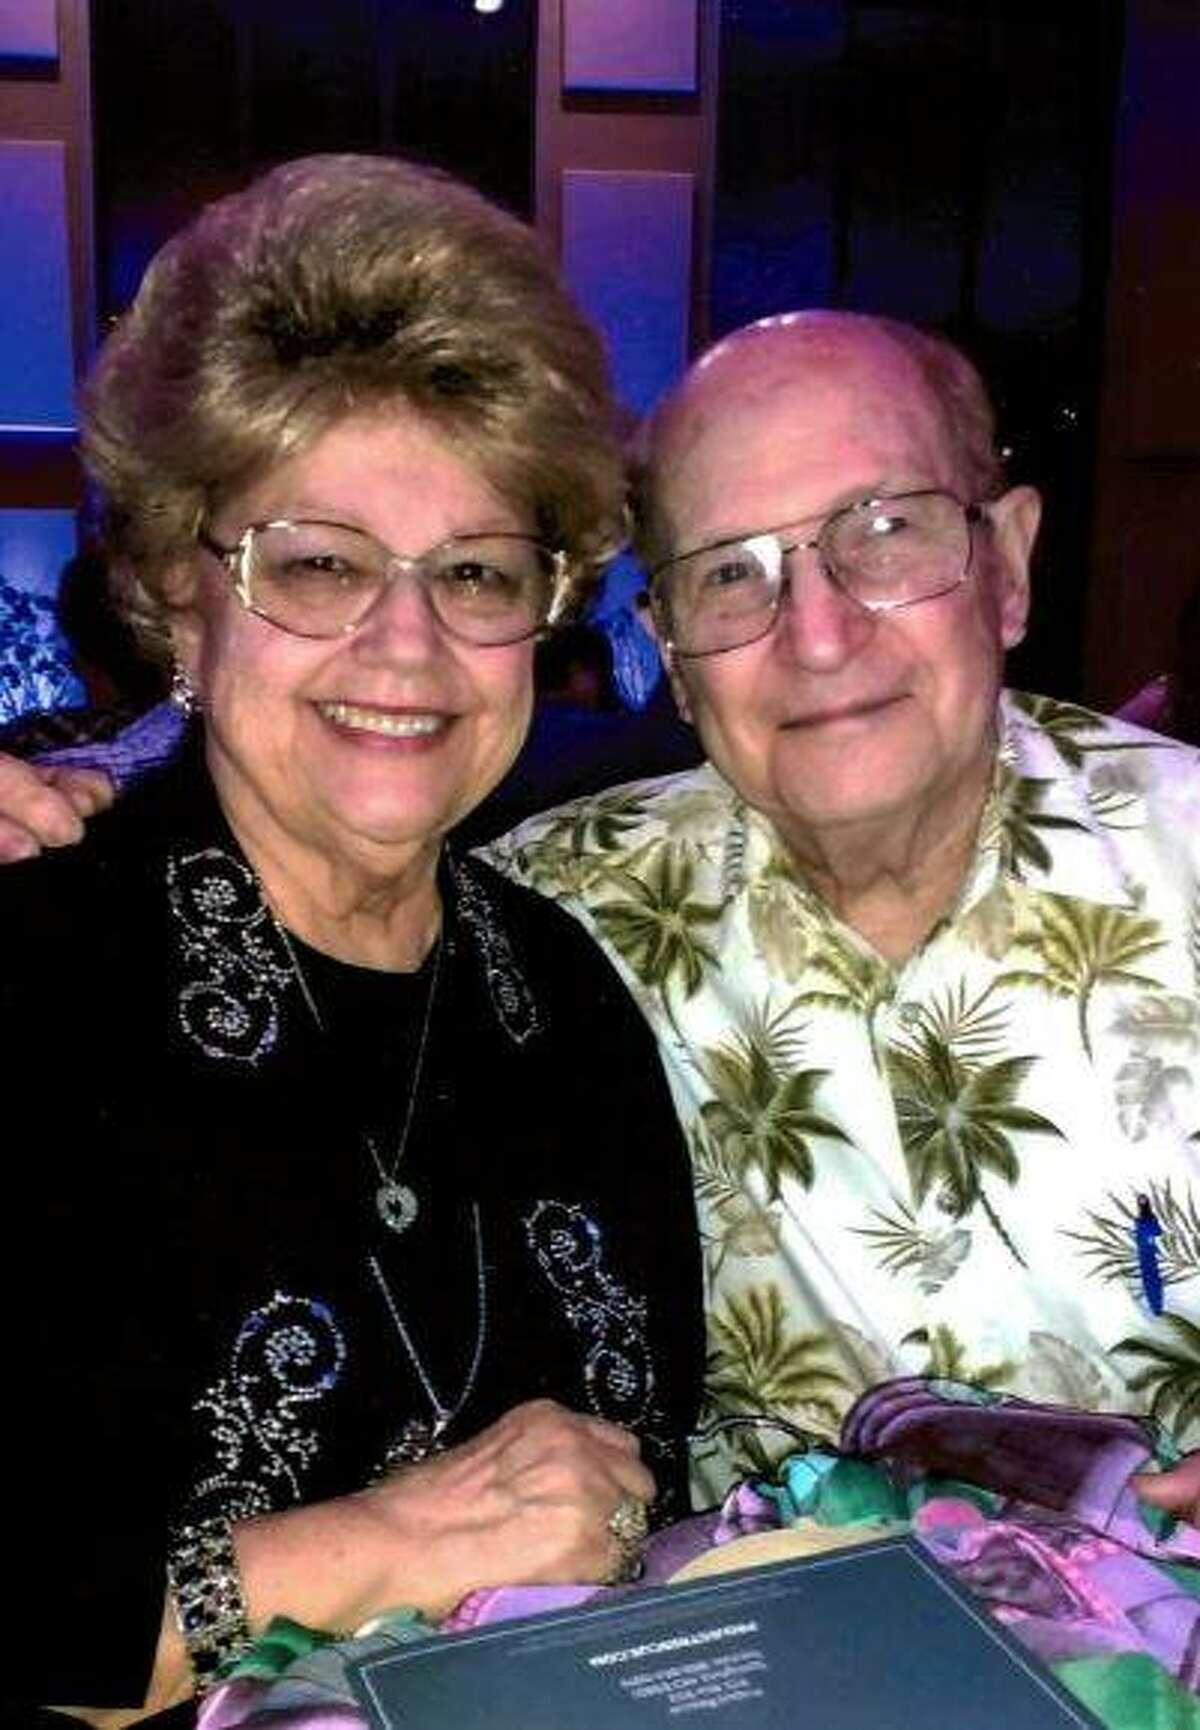 Vernon and Brenda Langer today